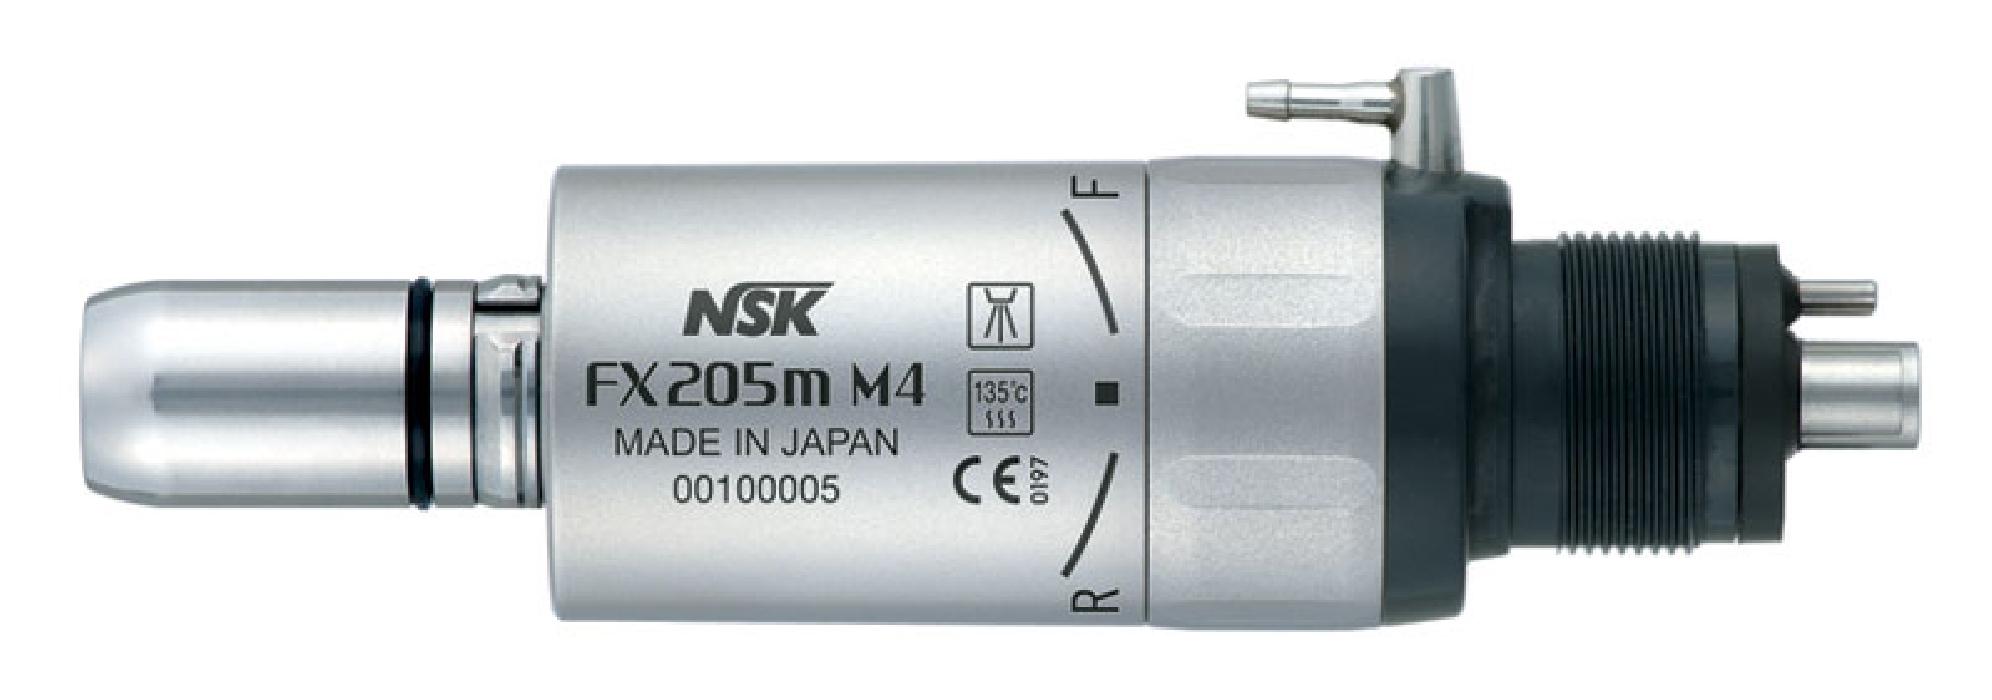 An image of FX205m M4